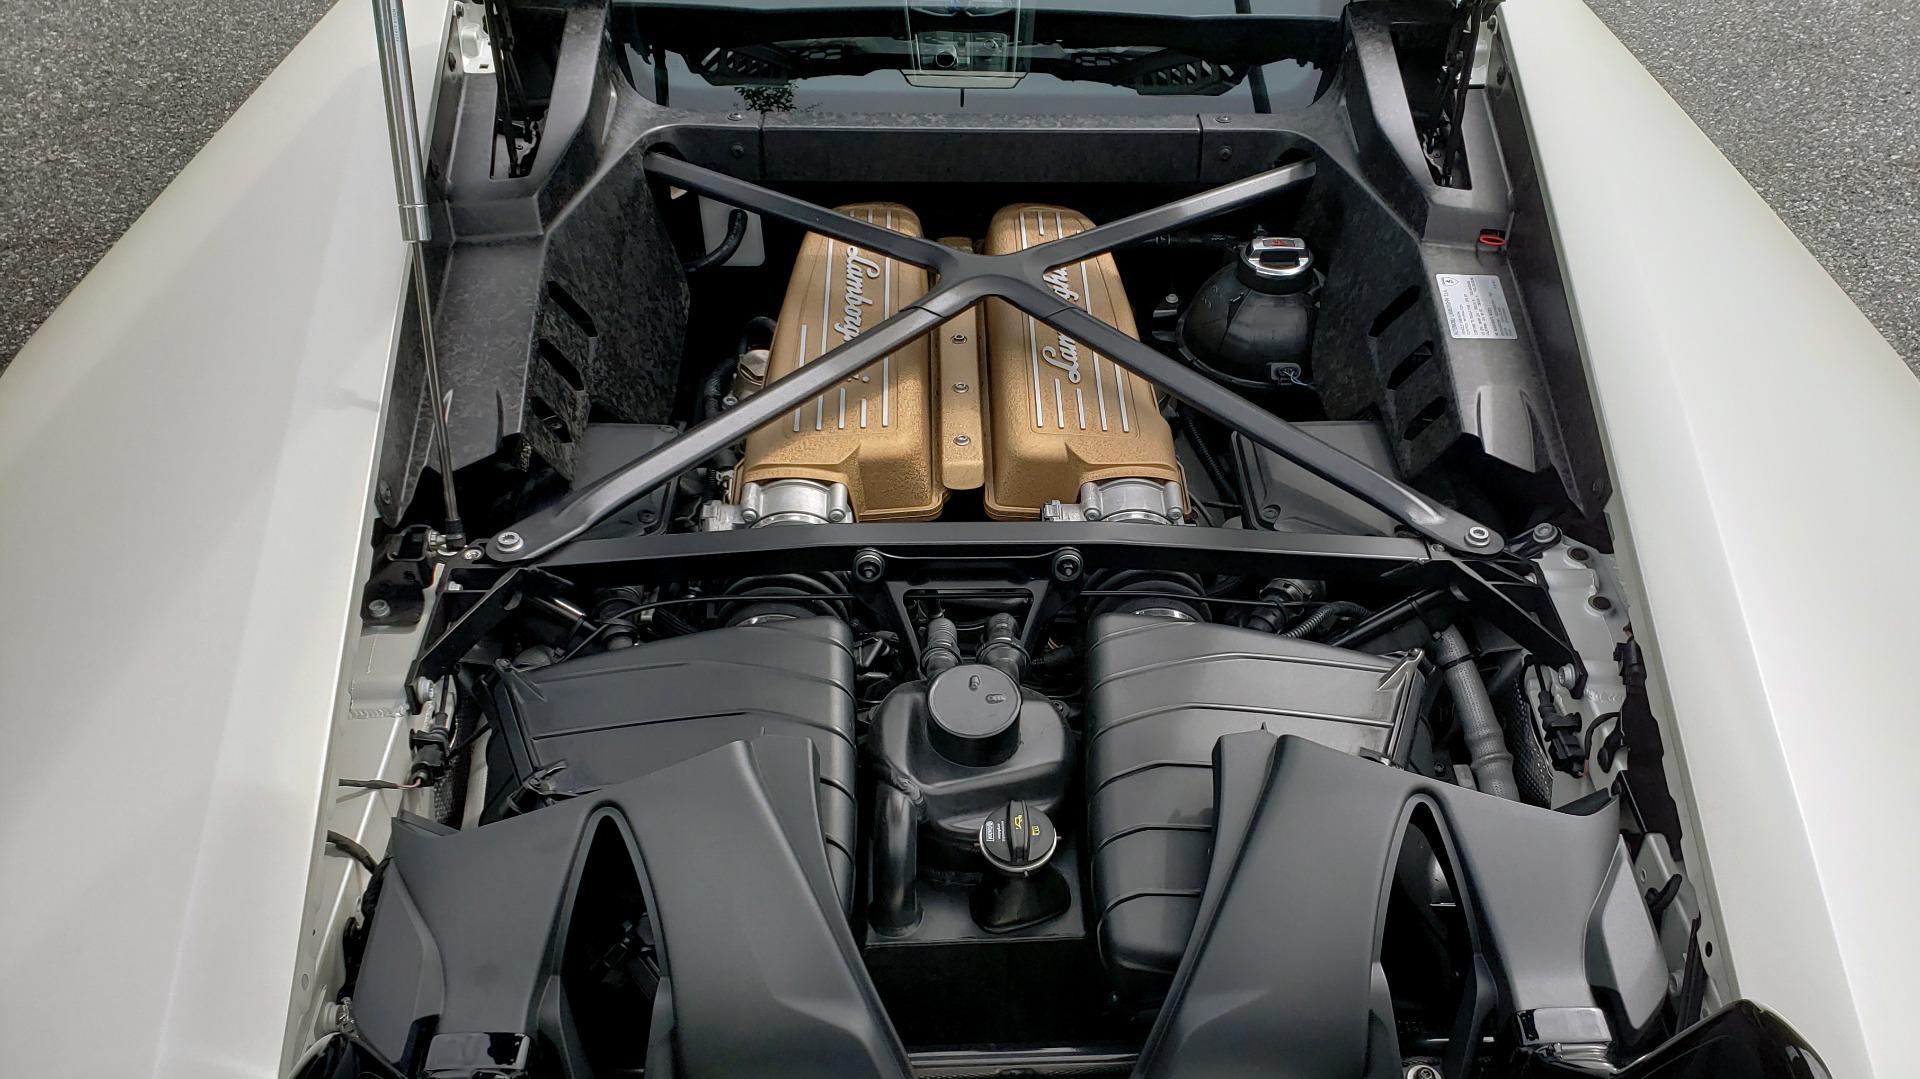 Used 2018 Lamborghini HURACAN PERFORMANTE 5.2L V10 / 630HP / 7-SPD AUTO / AWD / NAV / PREM SND for sale $269,995 at Formula Imports in Charlotte NC 28227 25